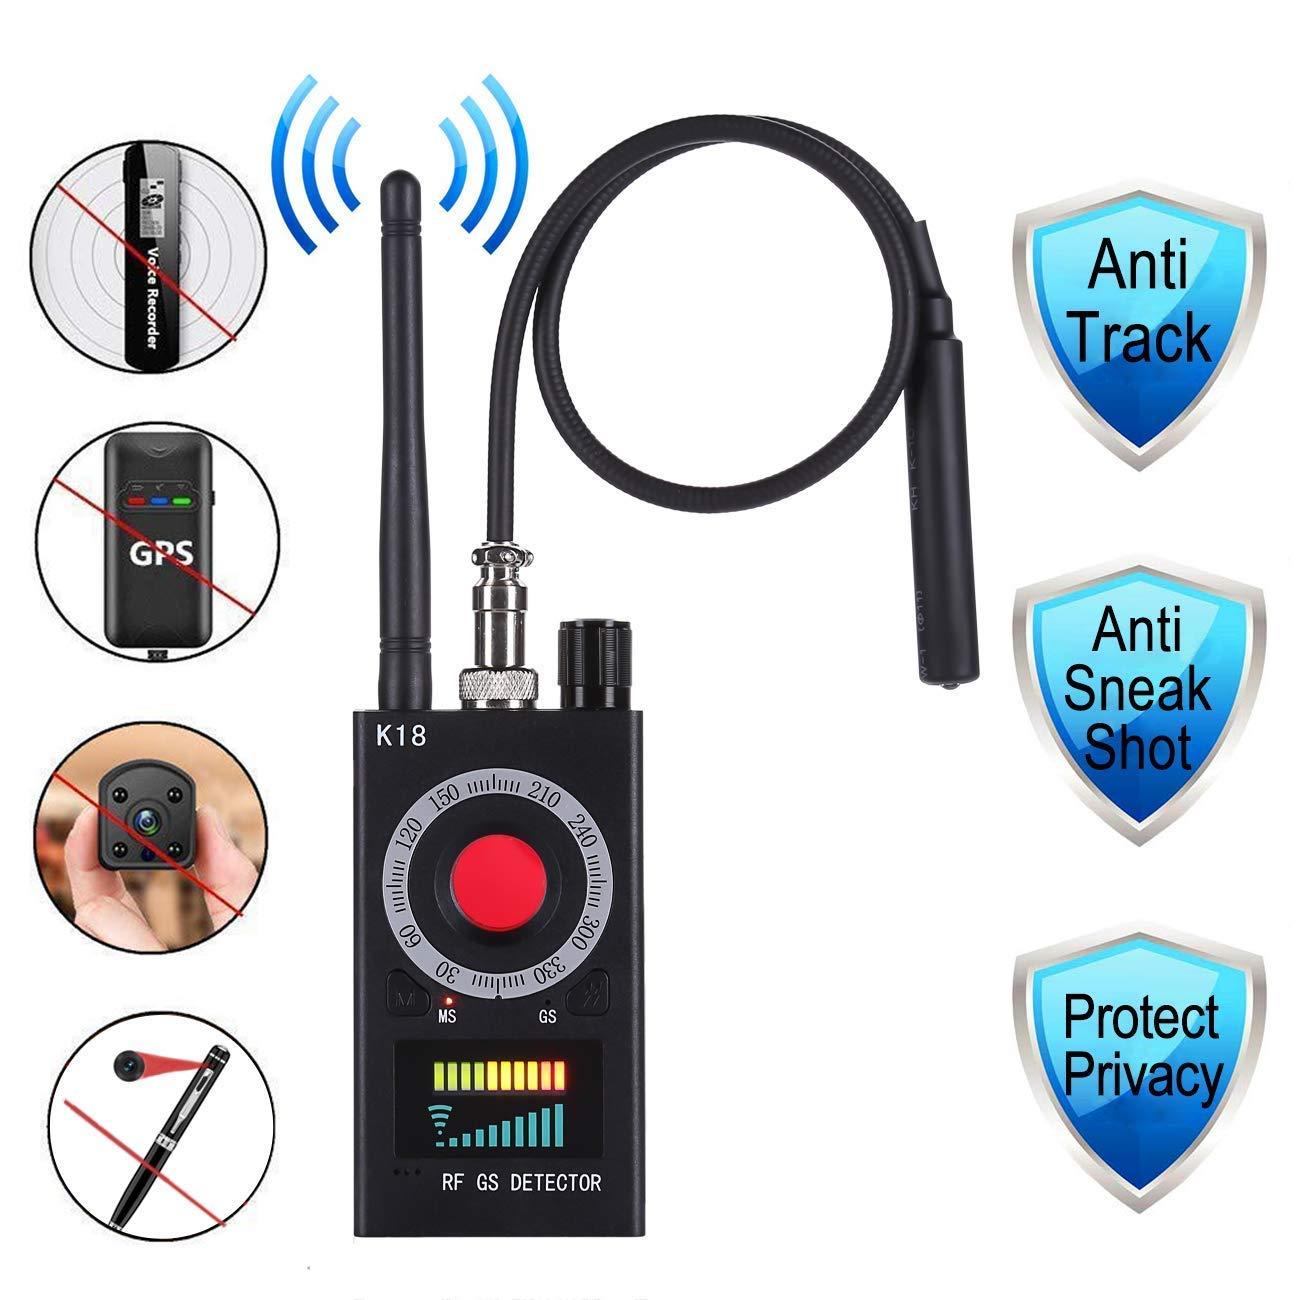 Anti Spy Detector & Camera Finder RF Signal Detector GPS Bug Detector Hidden Camera Detector for GSM Tracking Device GPS Radar Radio Frequency Detector by Valpha